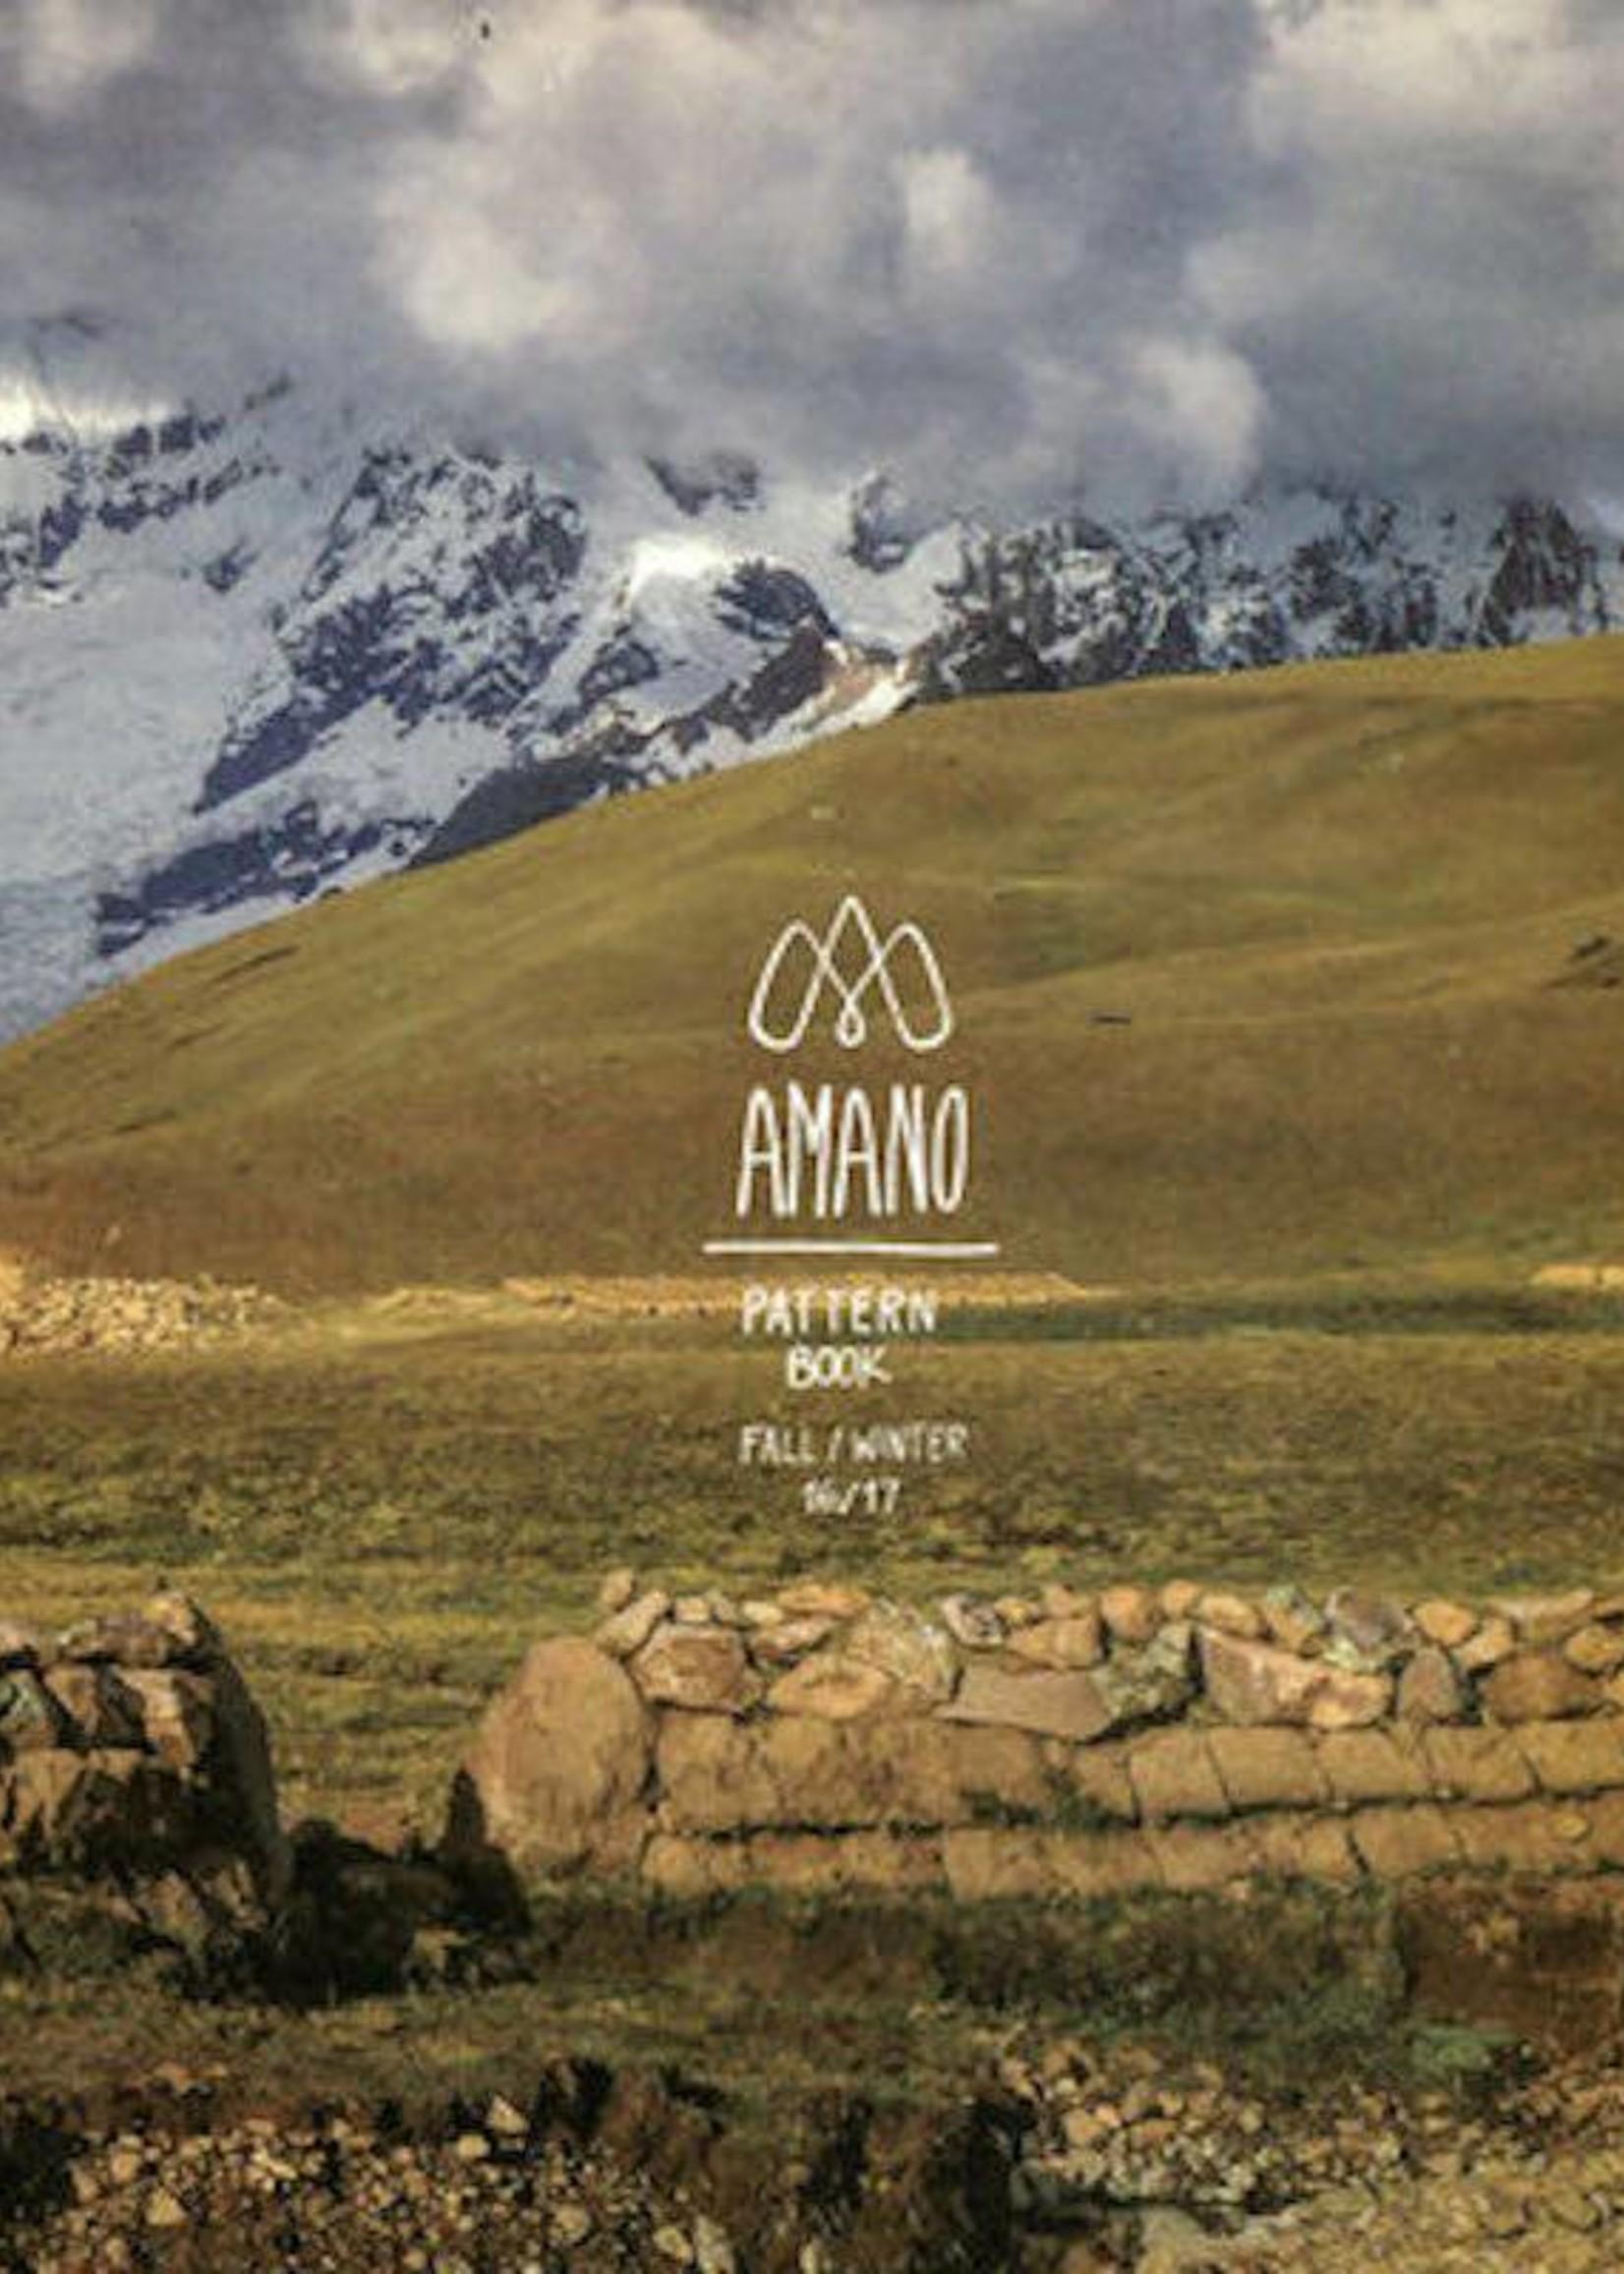 Amano Fall/Winter Vol2